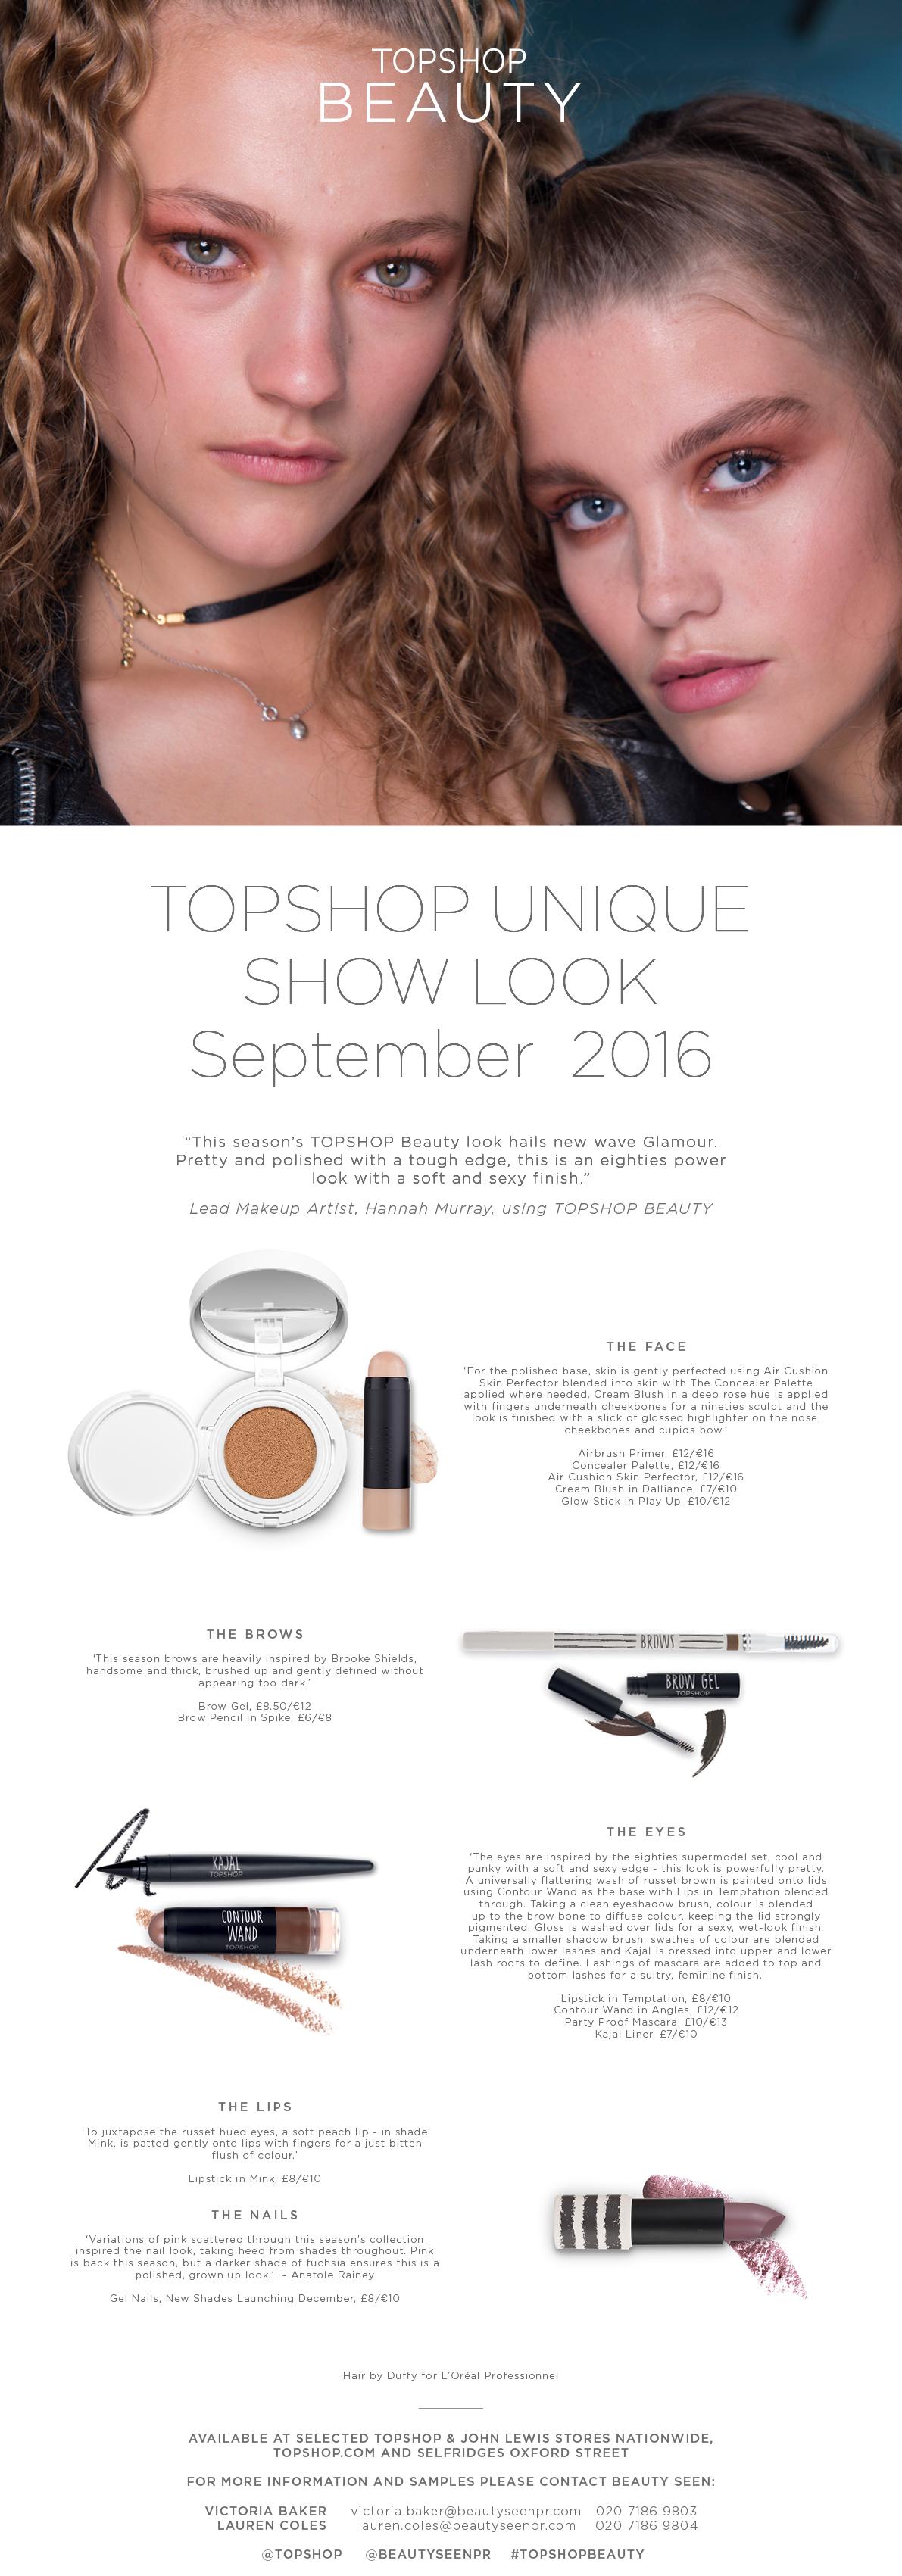 Beauty_Press Release_Unique Sept Show Look_UK Digital